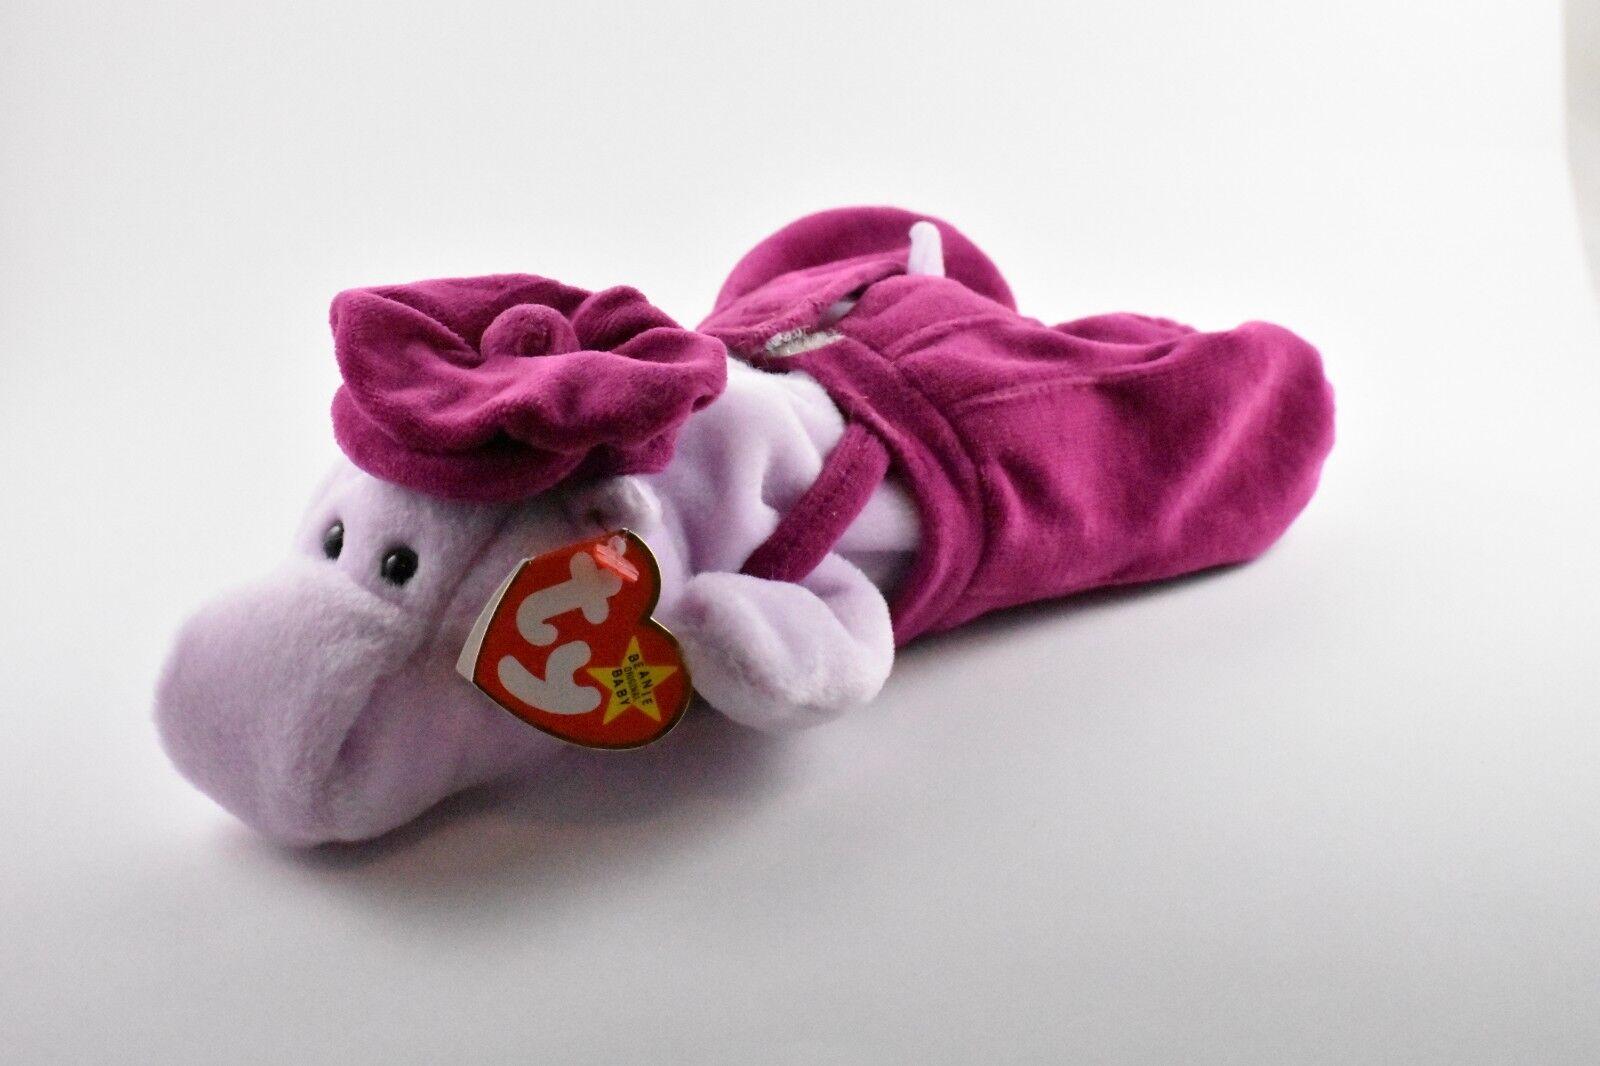 Happy The Hippo Ty Beanie Baby Rare. P.V.C. Pellets. W Teenie Beanie Gently Used